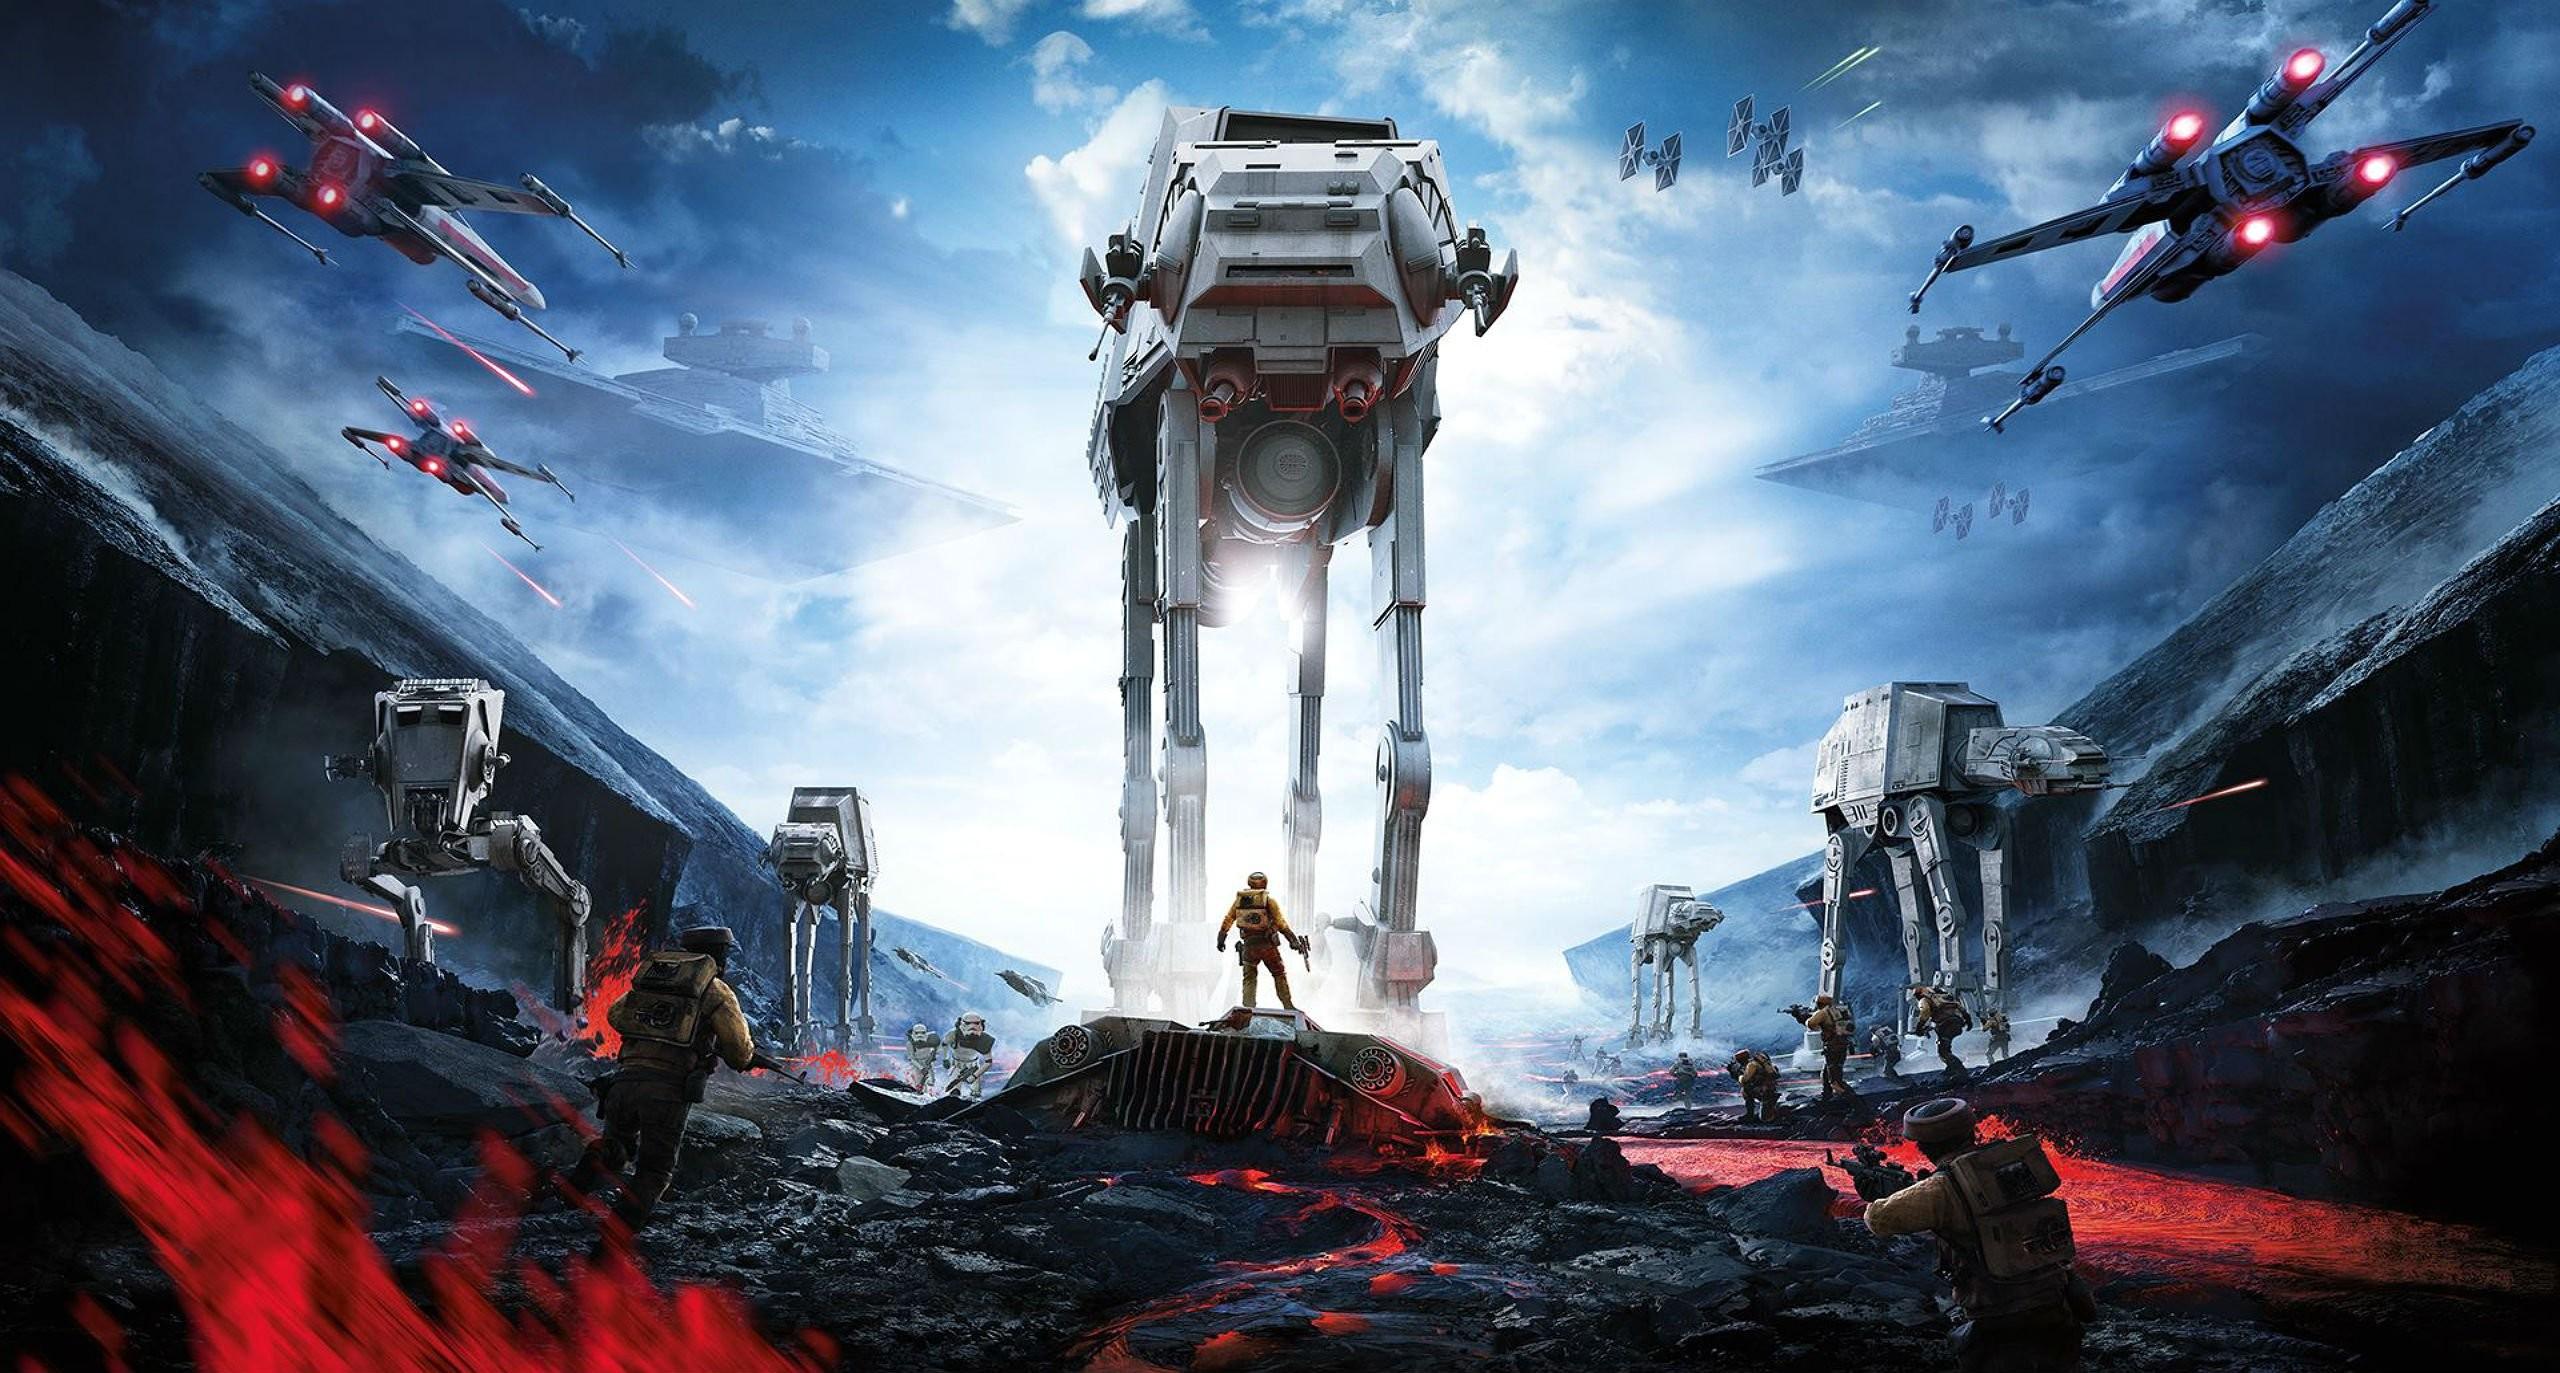 1080p Star Wars Battlefront Wallpaper Pictures